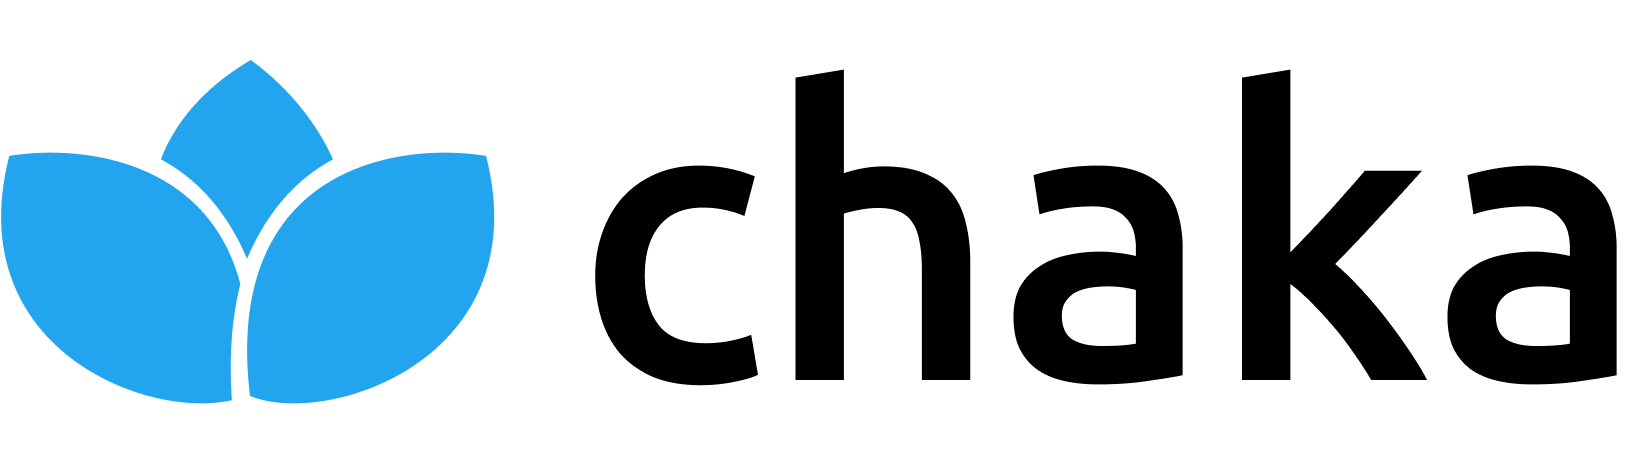 LOGO02 (2)